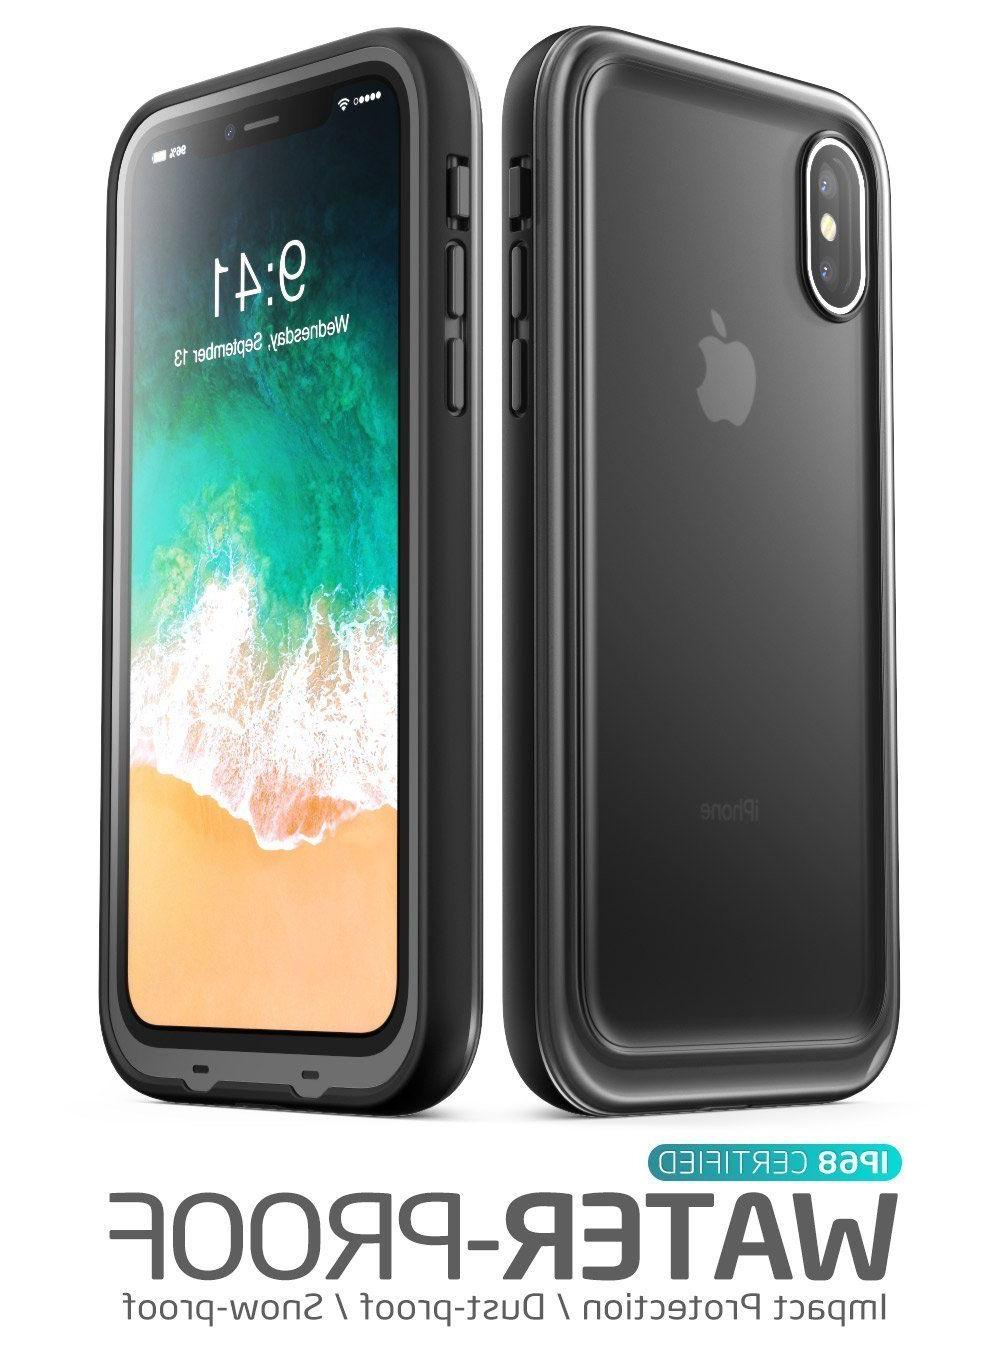 iPhone Waterproof Aegis Full-body Cover for 10